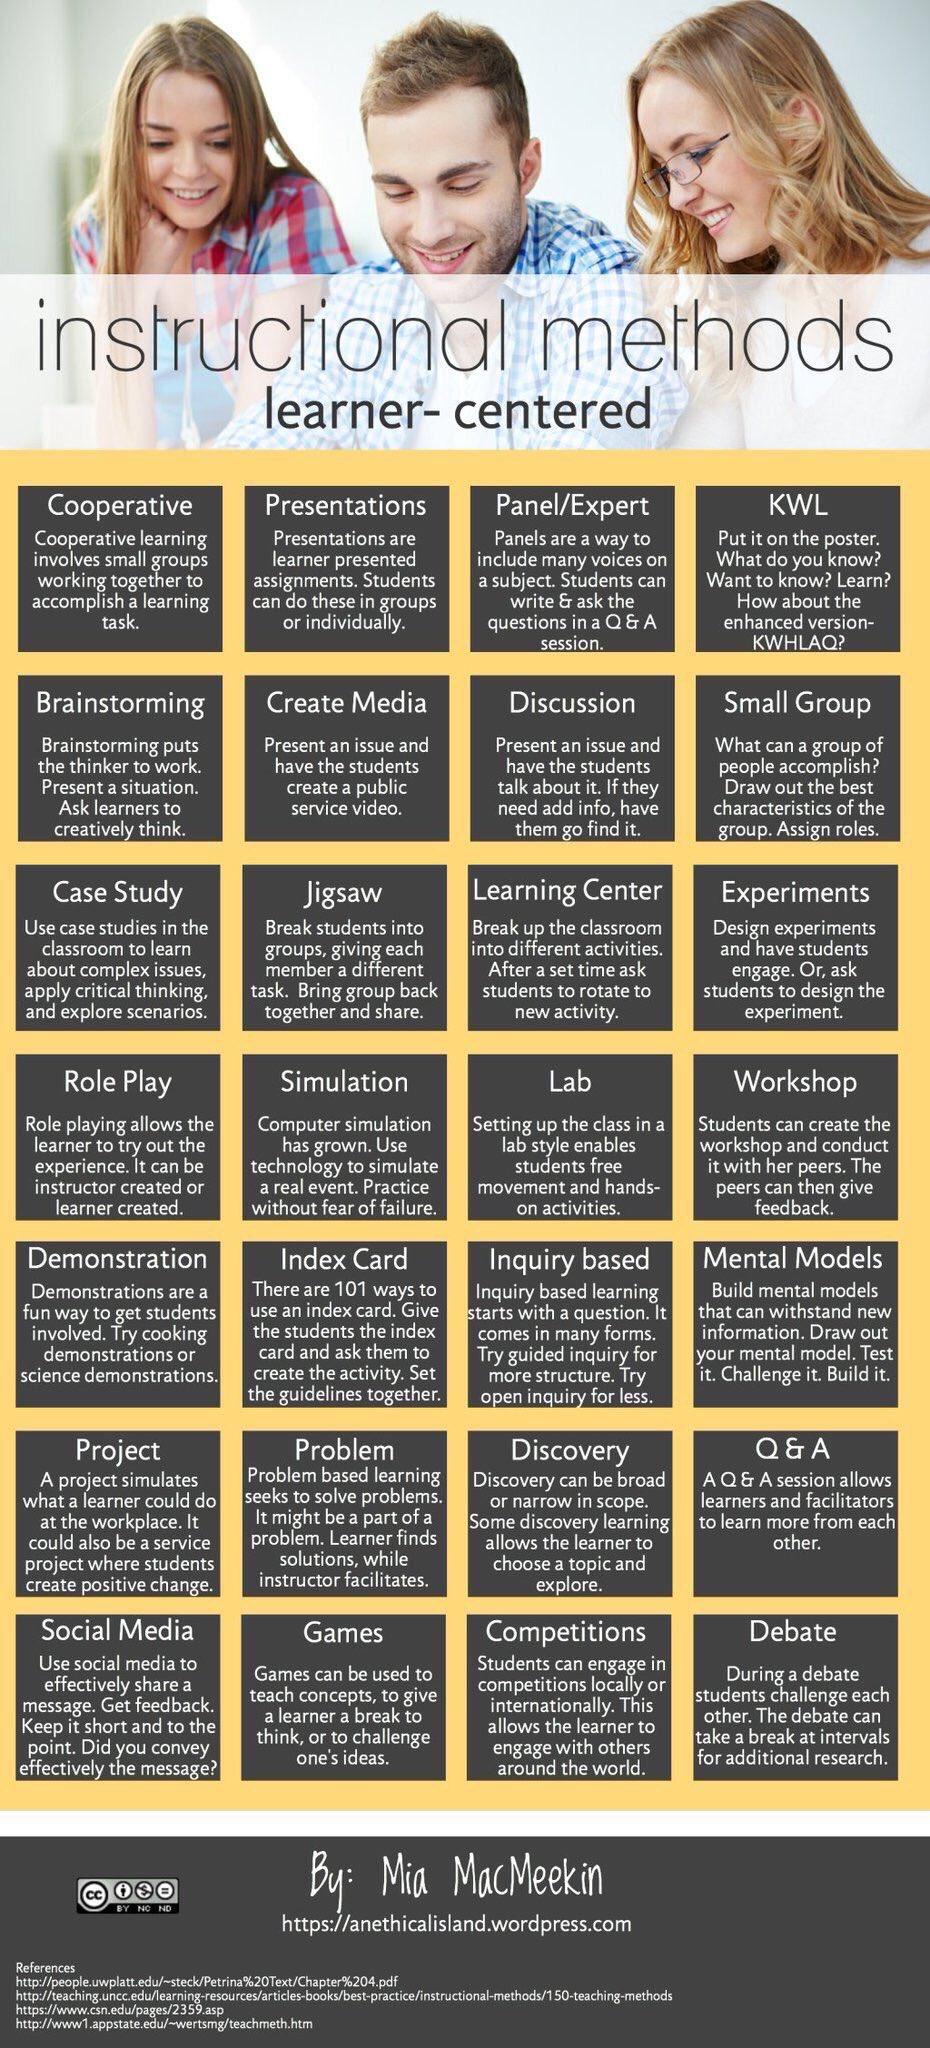 28 Learner-Centered Instructional Methods 👥🤔💡🏆 (by @MiaMacMeekin) #edchat #Education #edtech #elearning #learning #ukedchat https://t.co/vdpEz4yeJC